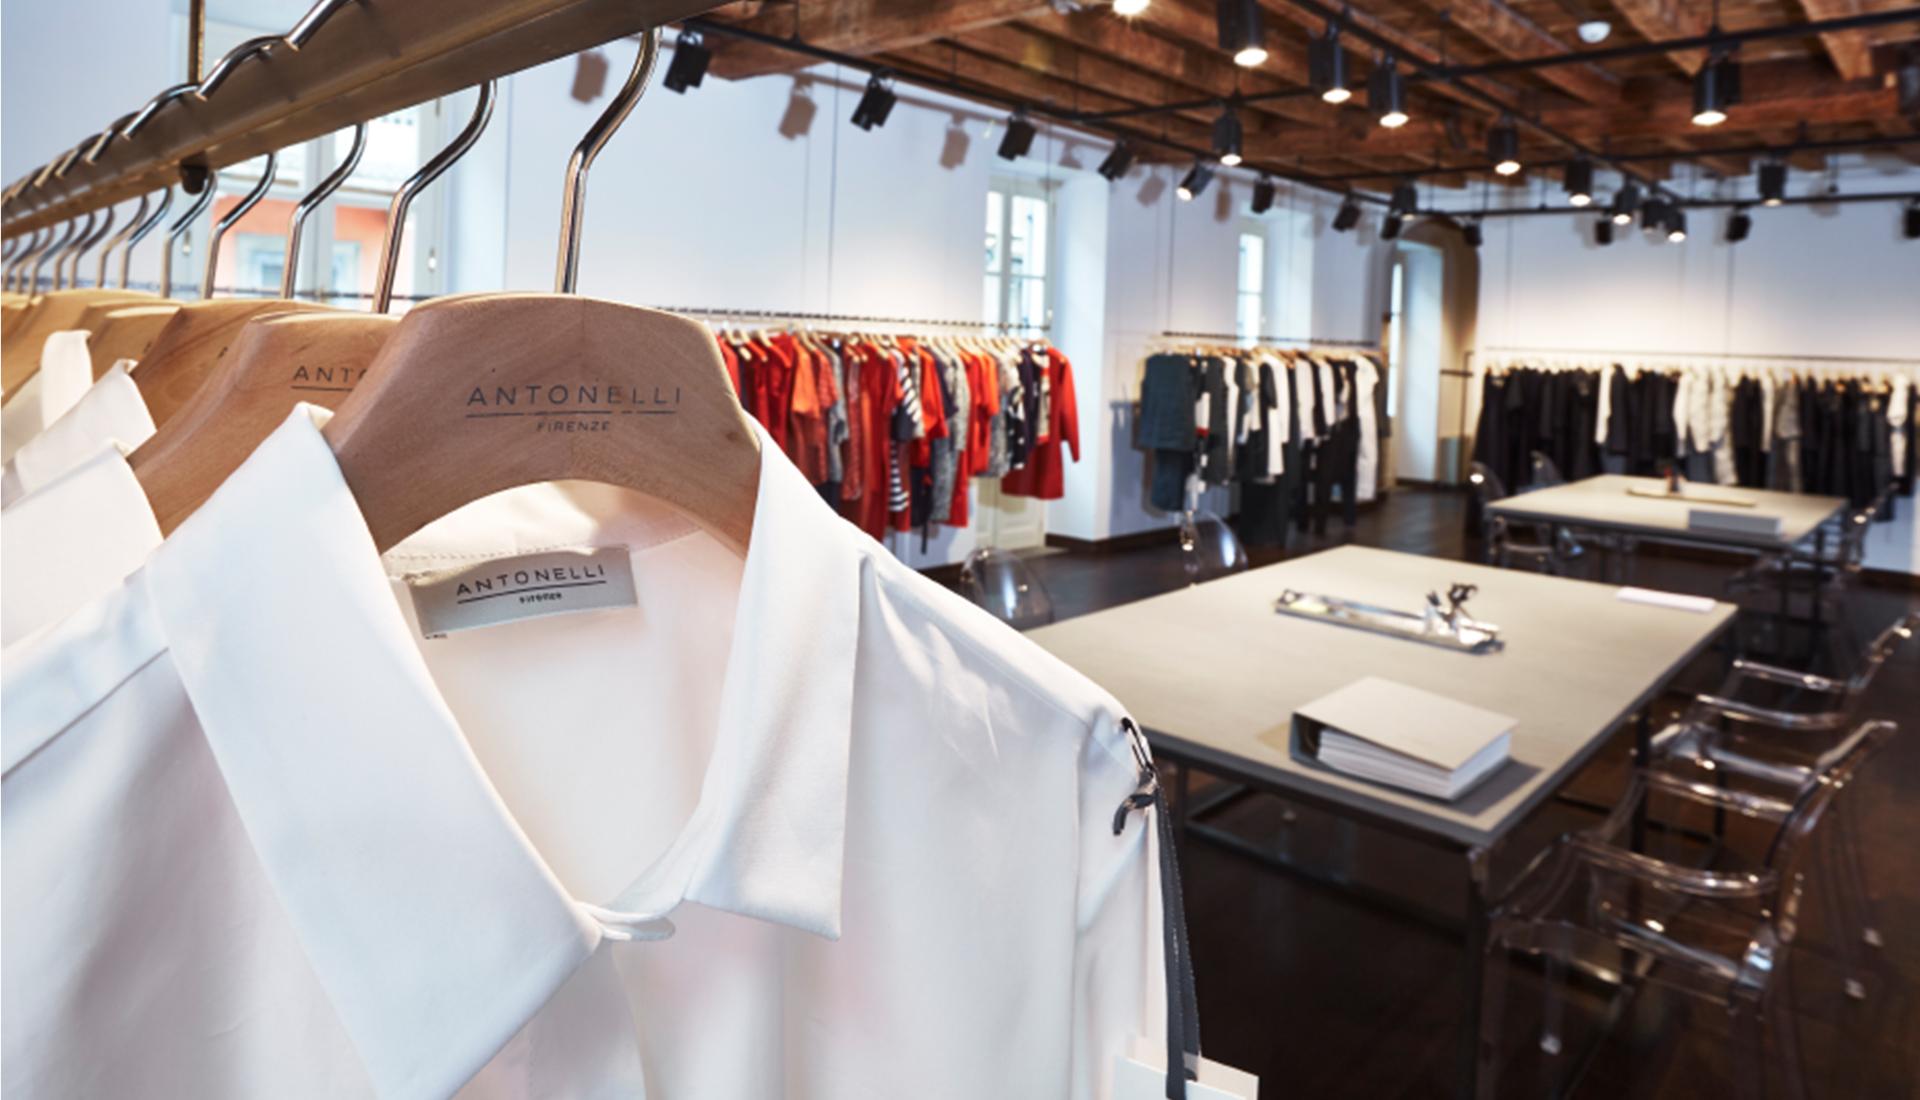 Showroom Antonelli Firenze in Via Tortona 21 - Milano, immagine 1